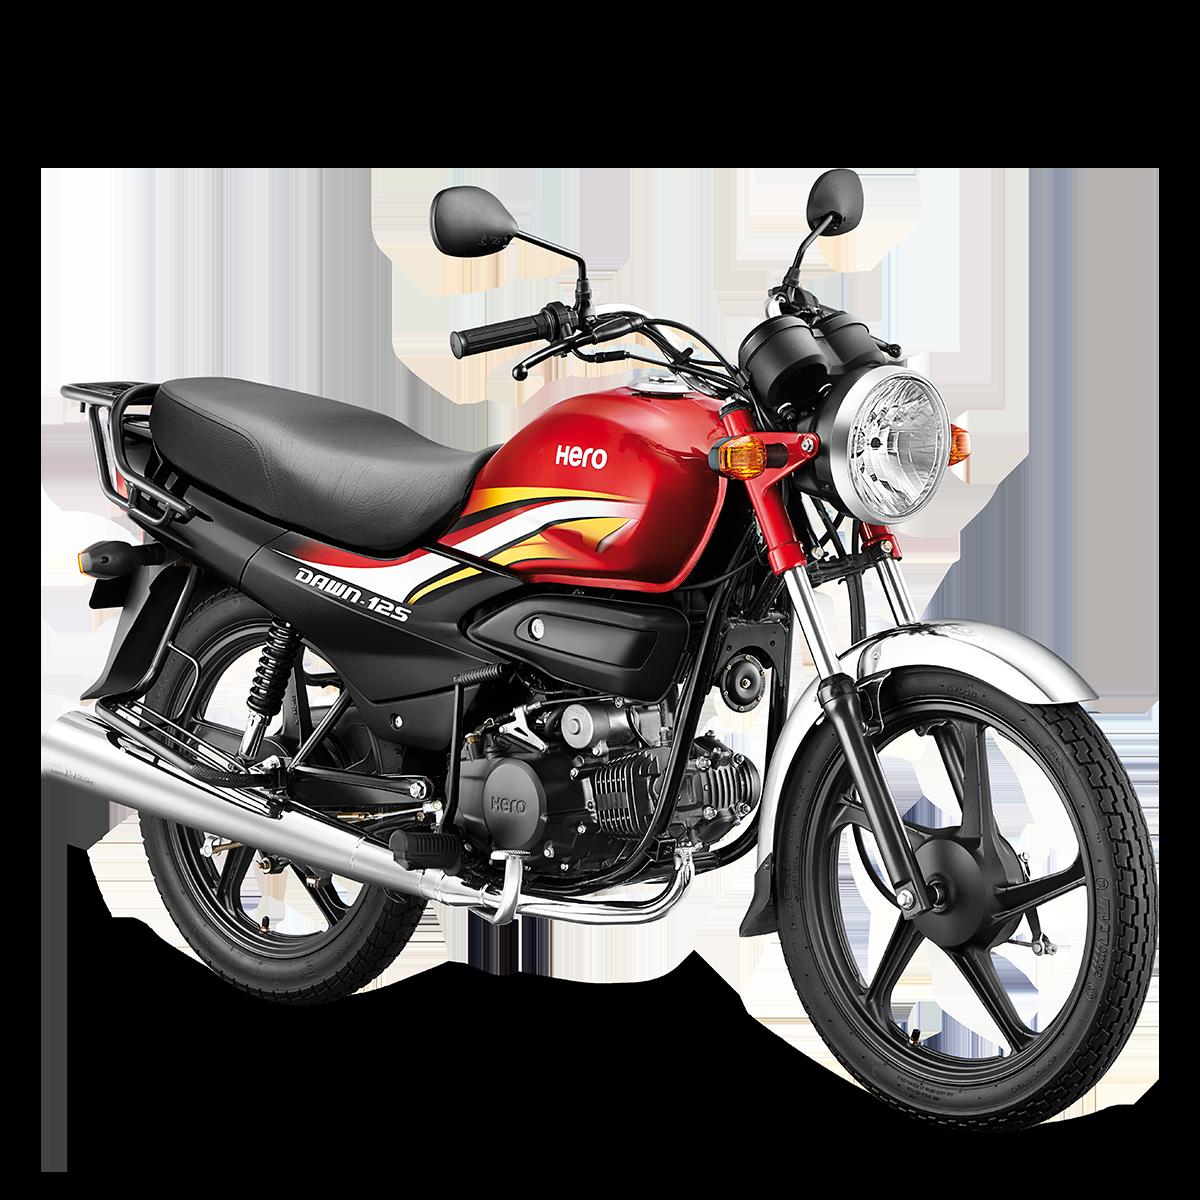 DAWN 125 - Motor: 125cc / Potencia: 9.12 bhpPrecio: $1,100.00